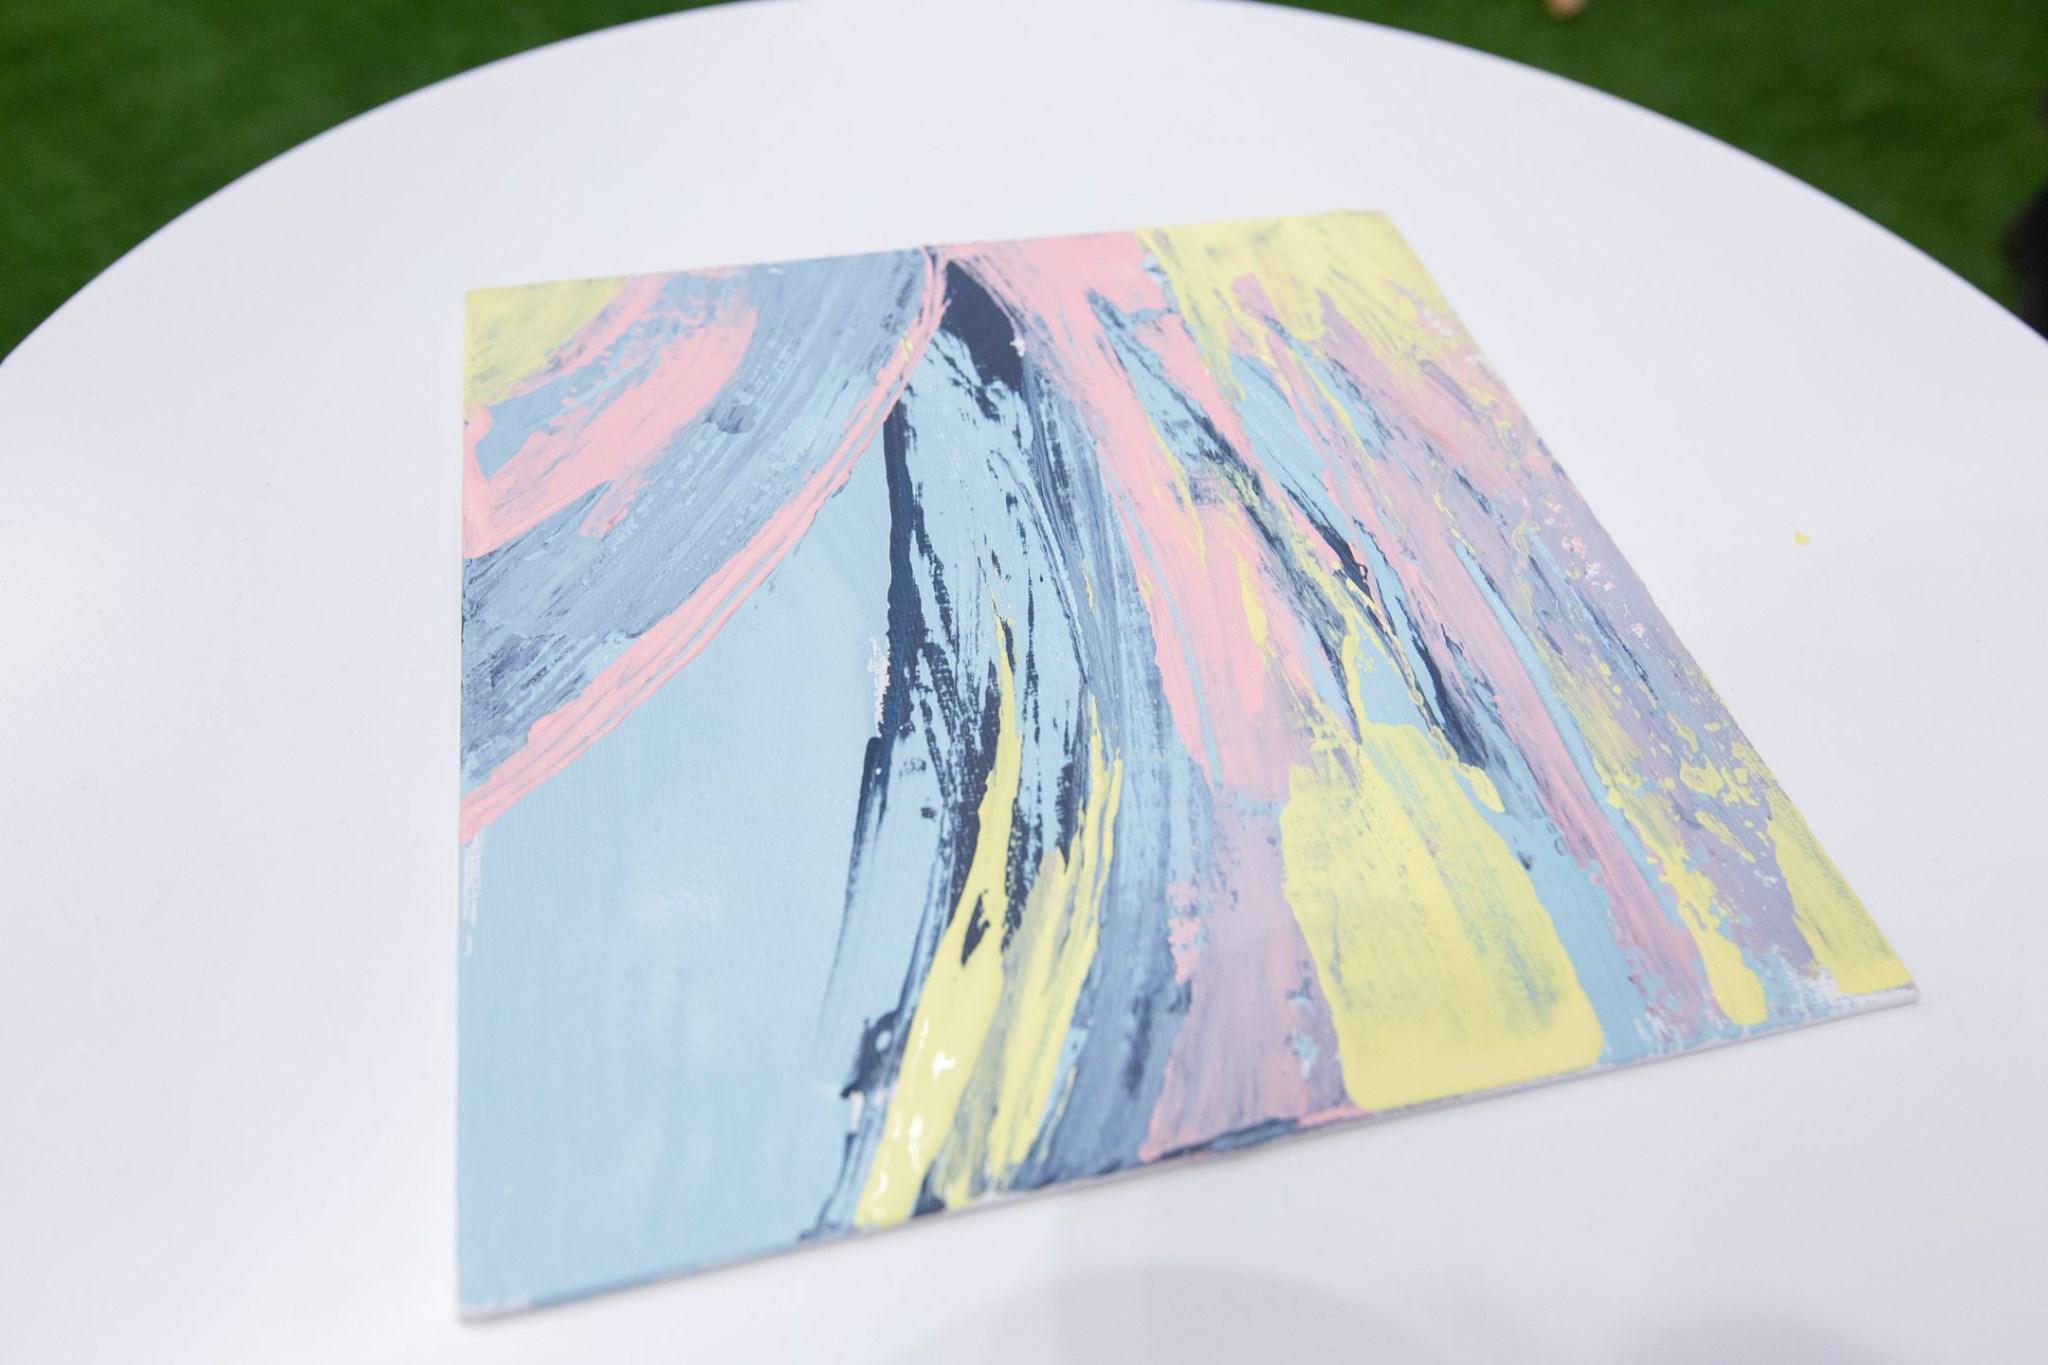 Kids & Teen Art Classes with ArtsClub | Art Supplies Included 4